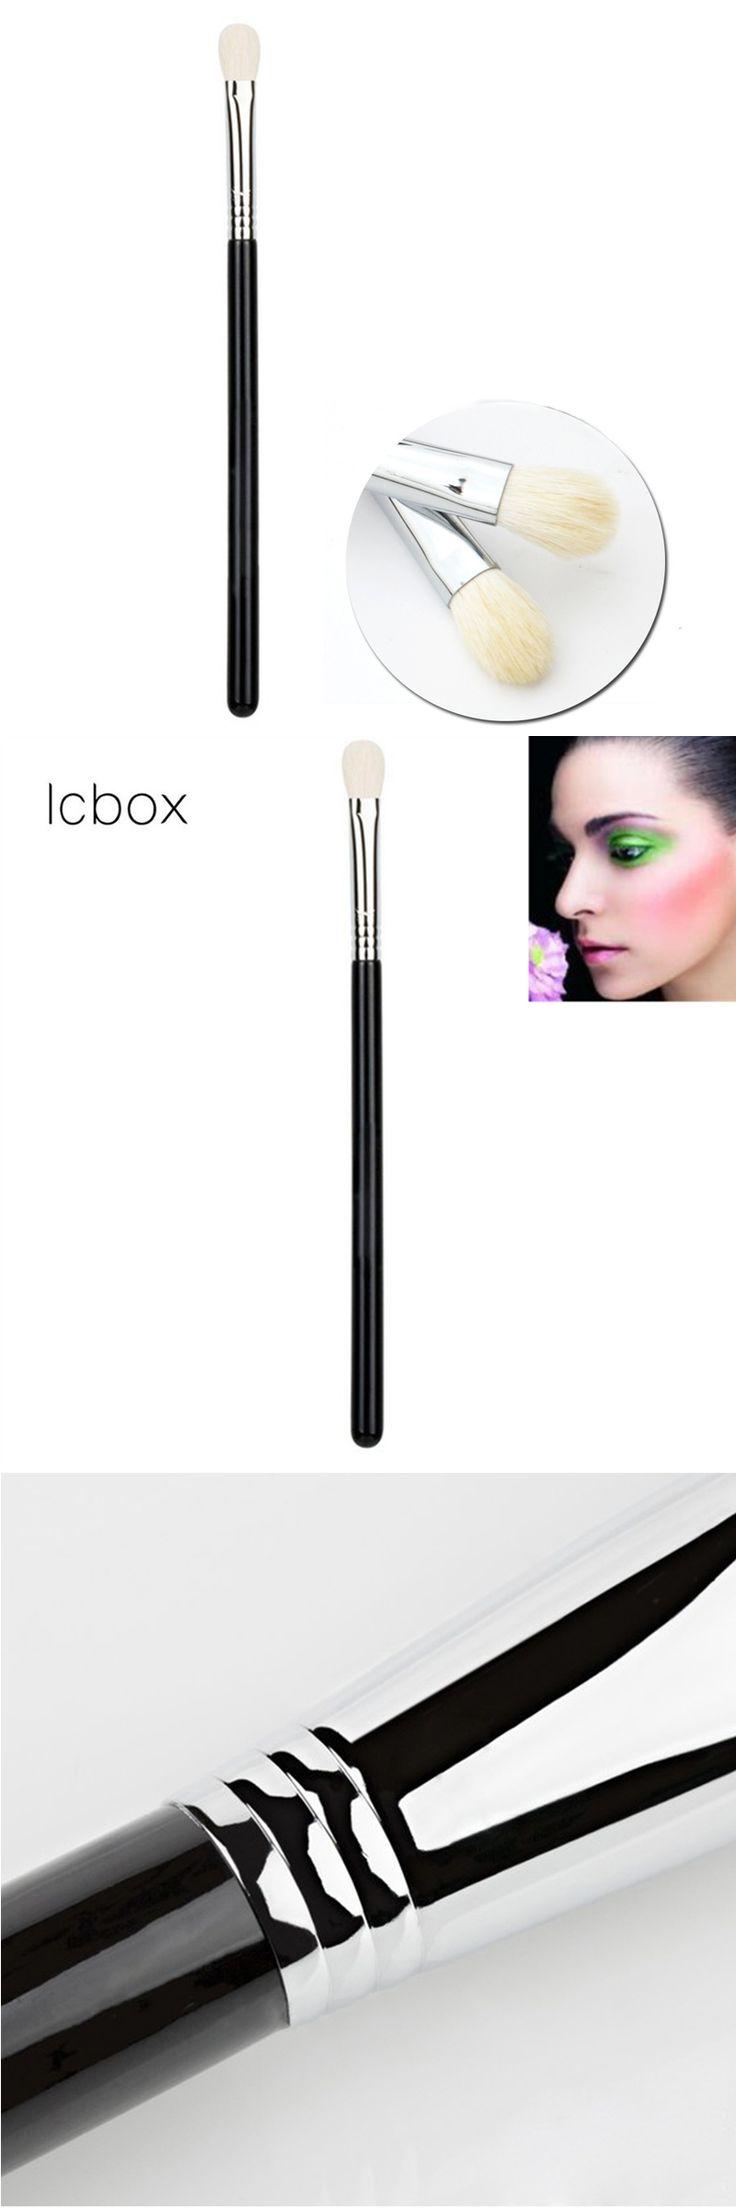 Full Professional 217# Makeup Brushes for Eyeshadow handmade Wool Fiber cosmetics Women Make-up brush foundation base brush kit